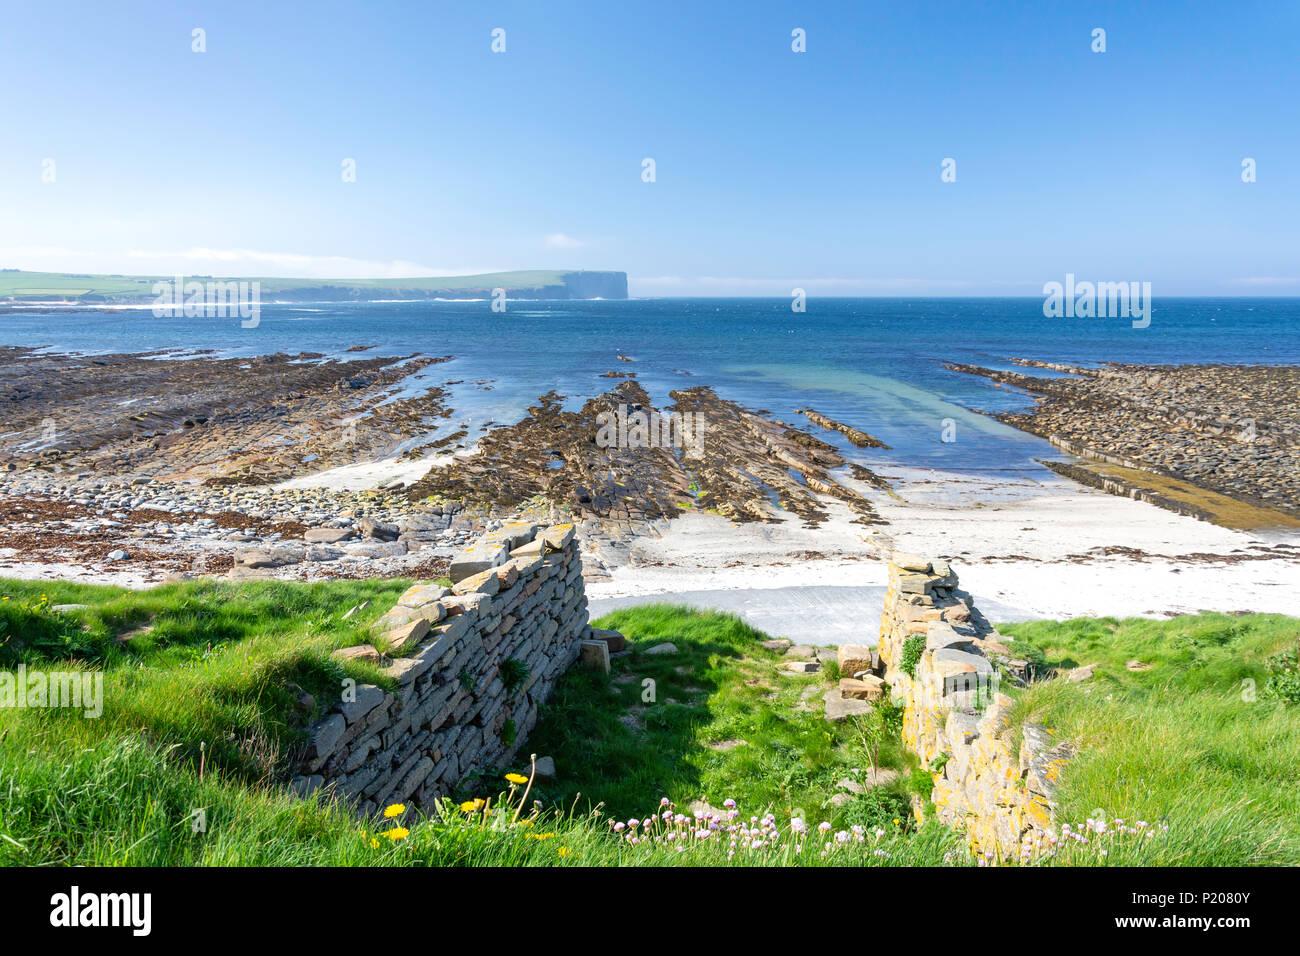 Birsay Bay, Birsay, Mainland, Orkney Islands, Northern Isles, Scotland, United Kingdom - Stock Image